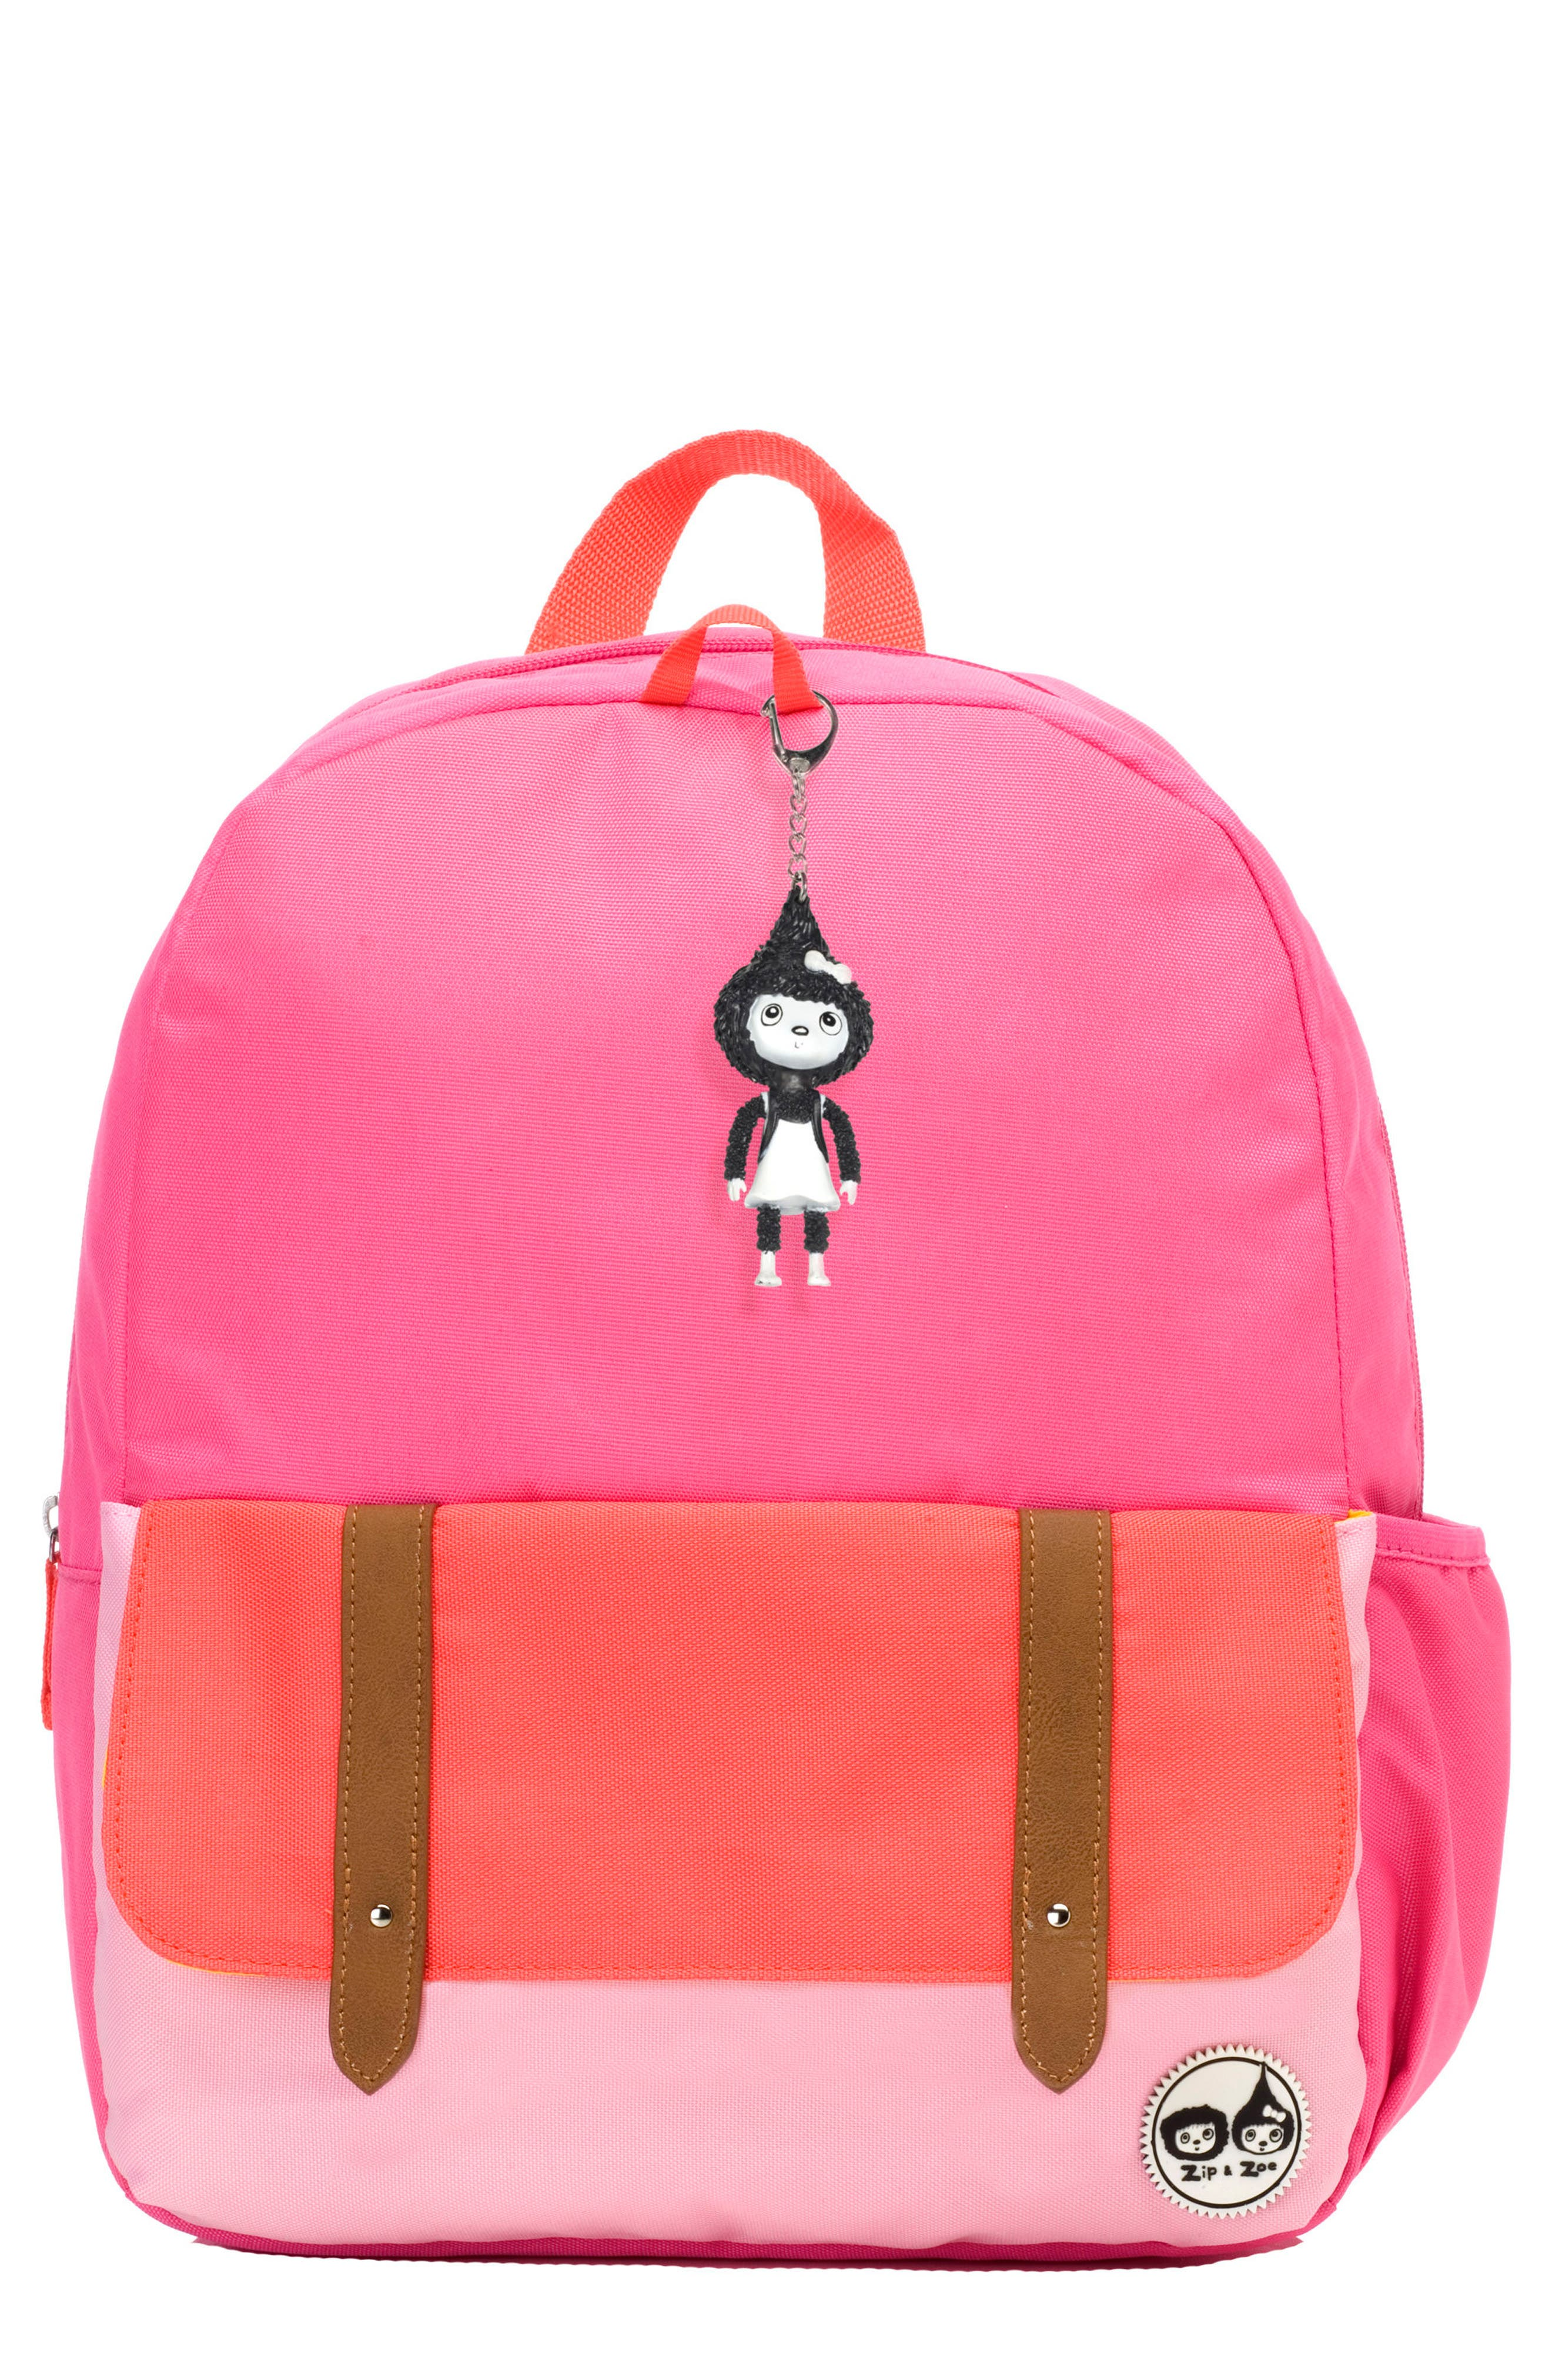 Alternate Image 1 Selected - Babymel Zip & Zoe Colorblock Junior Backpack (Kids)